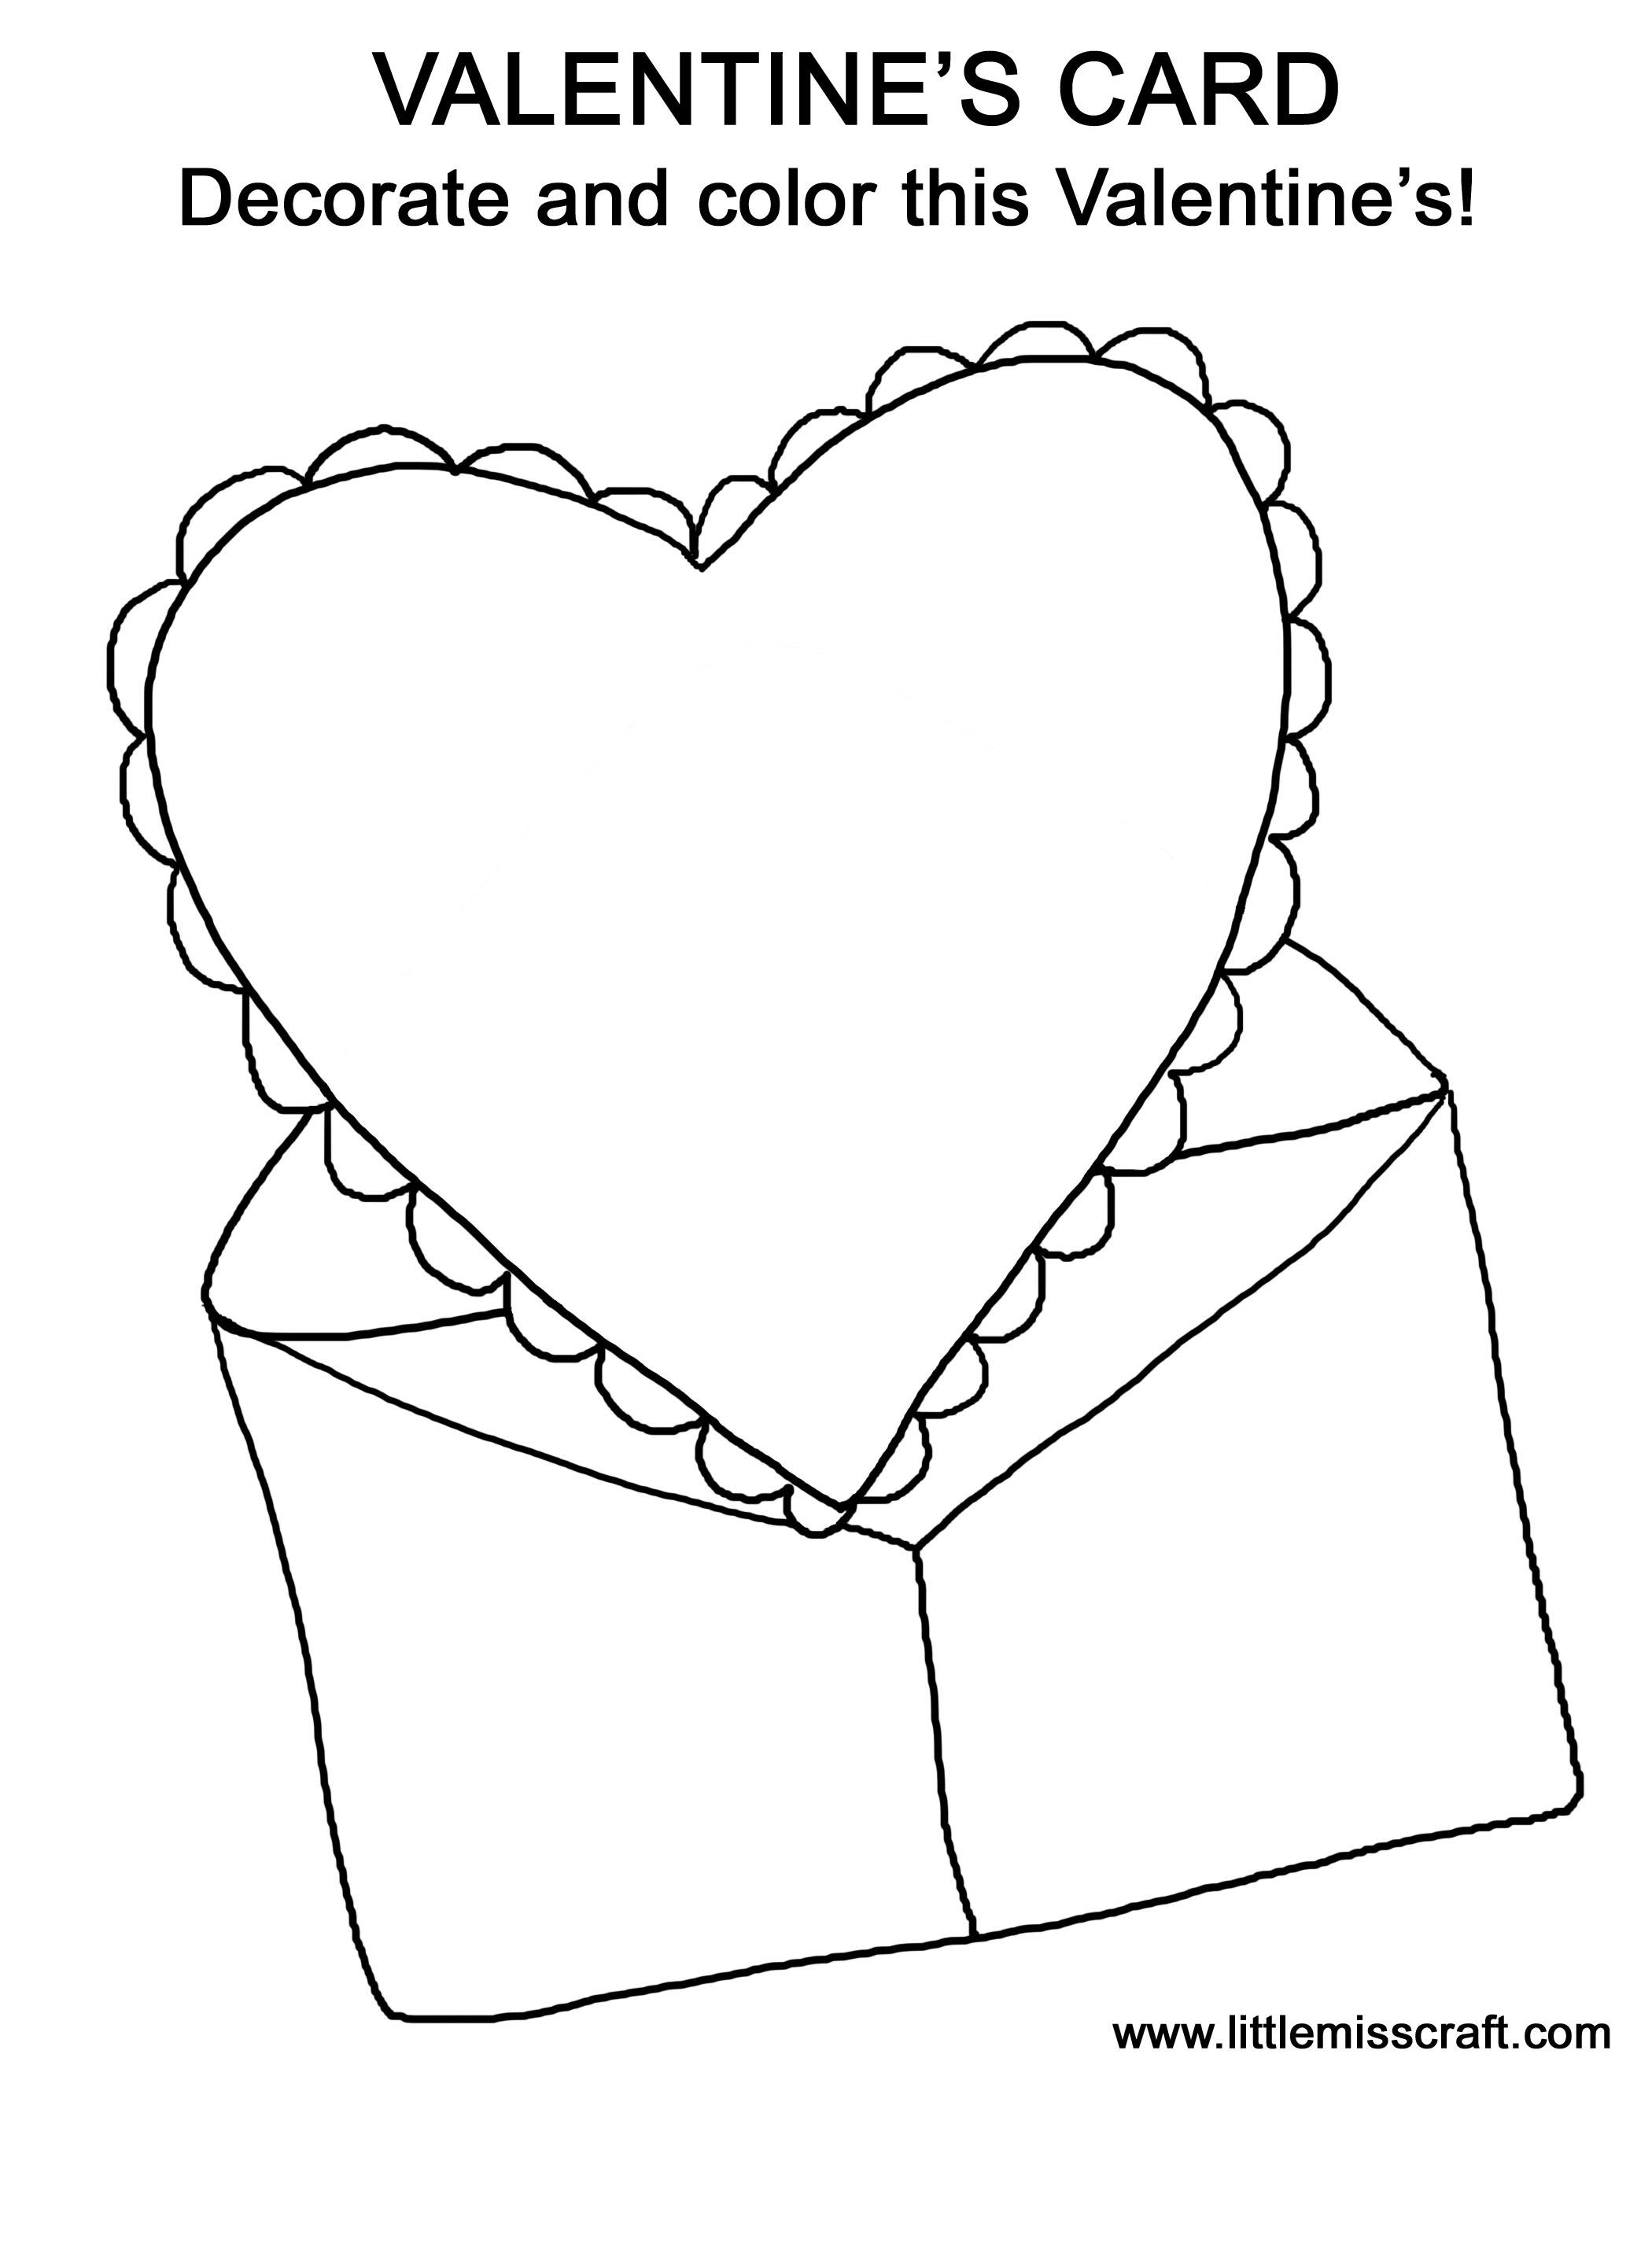 Valentines Card Drawing At Getdrawings